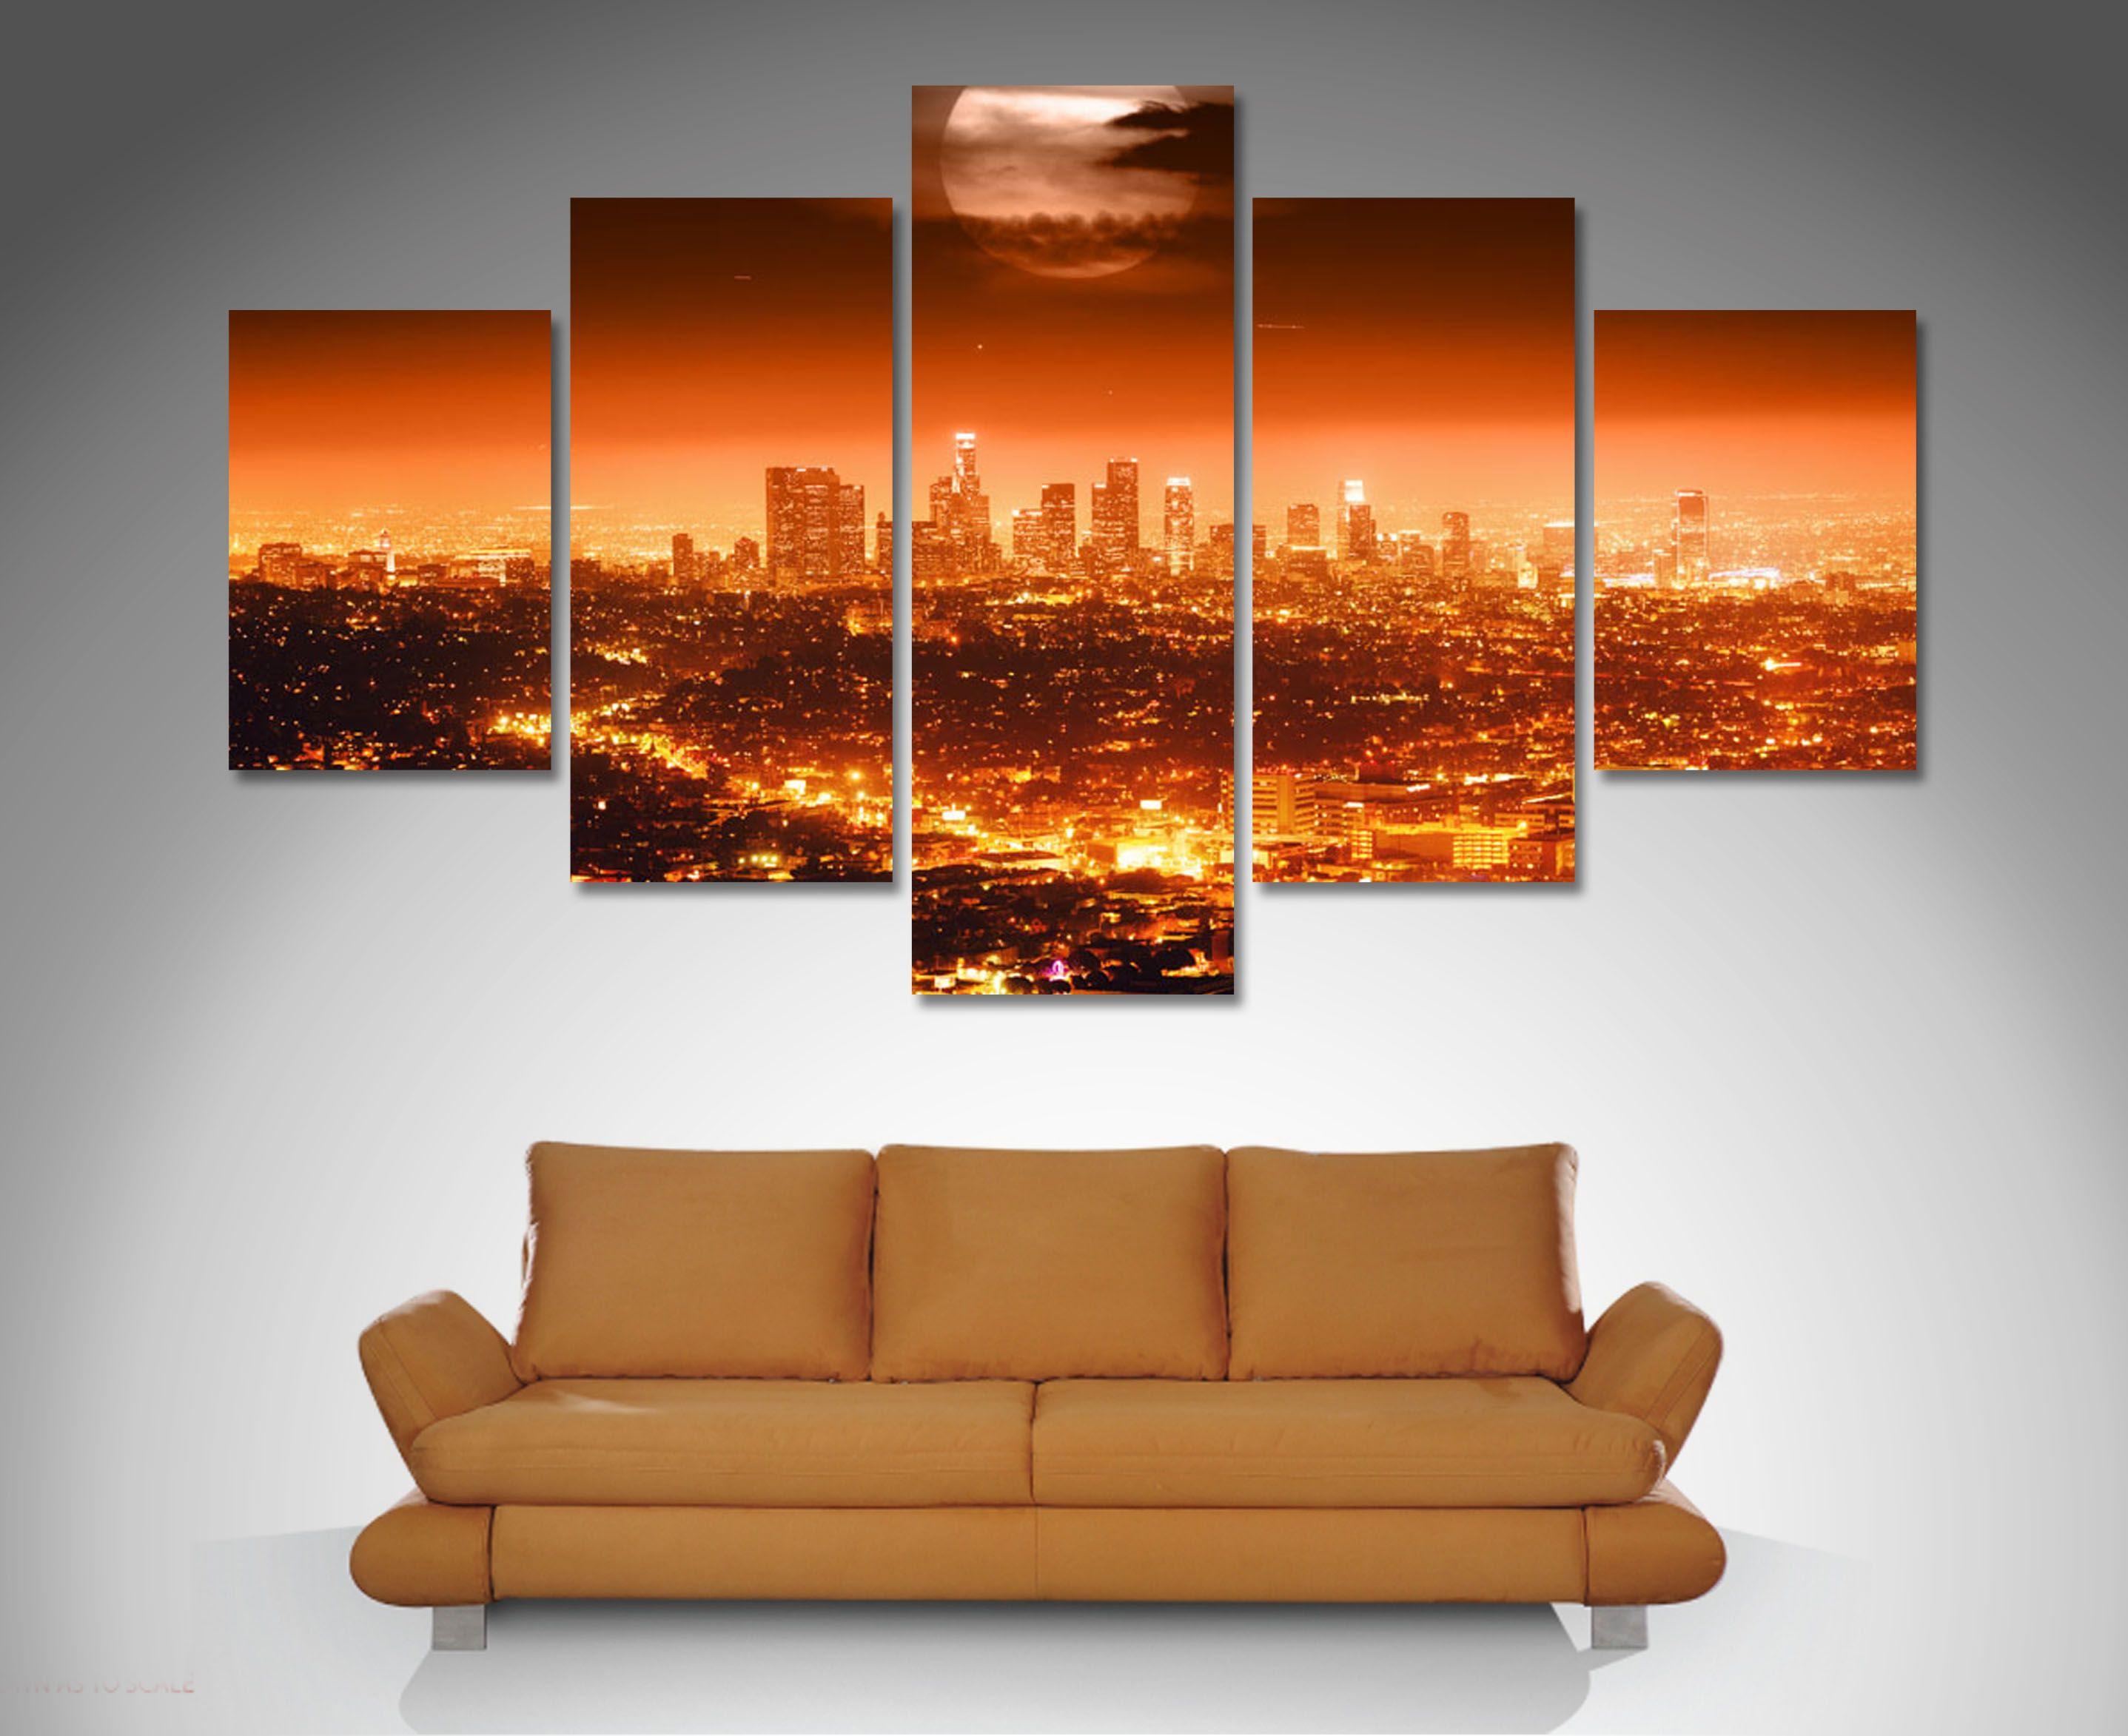 los angeles 5 panel wall art canvas prints 5 panel wall on canvas wall art id=27780